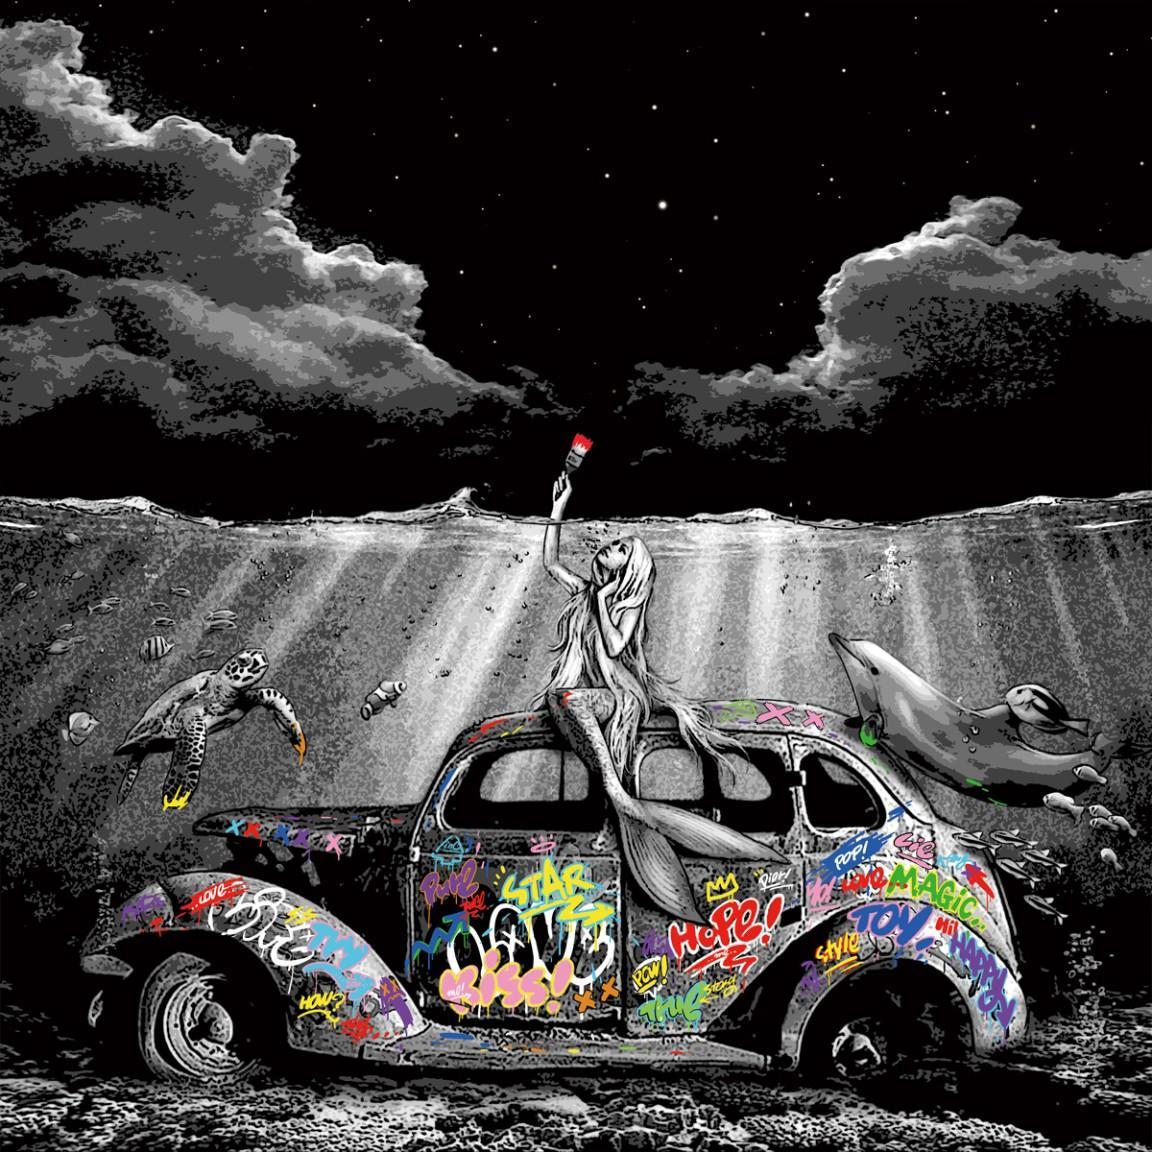 Roamcouch - We Live here - Urban Graffiti Street Art